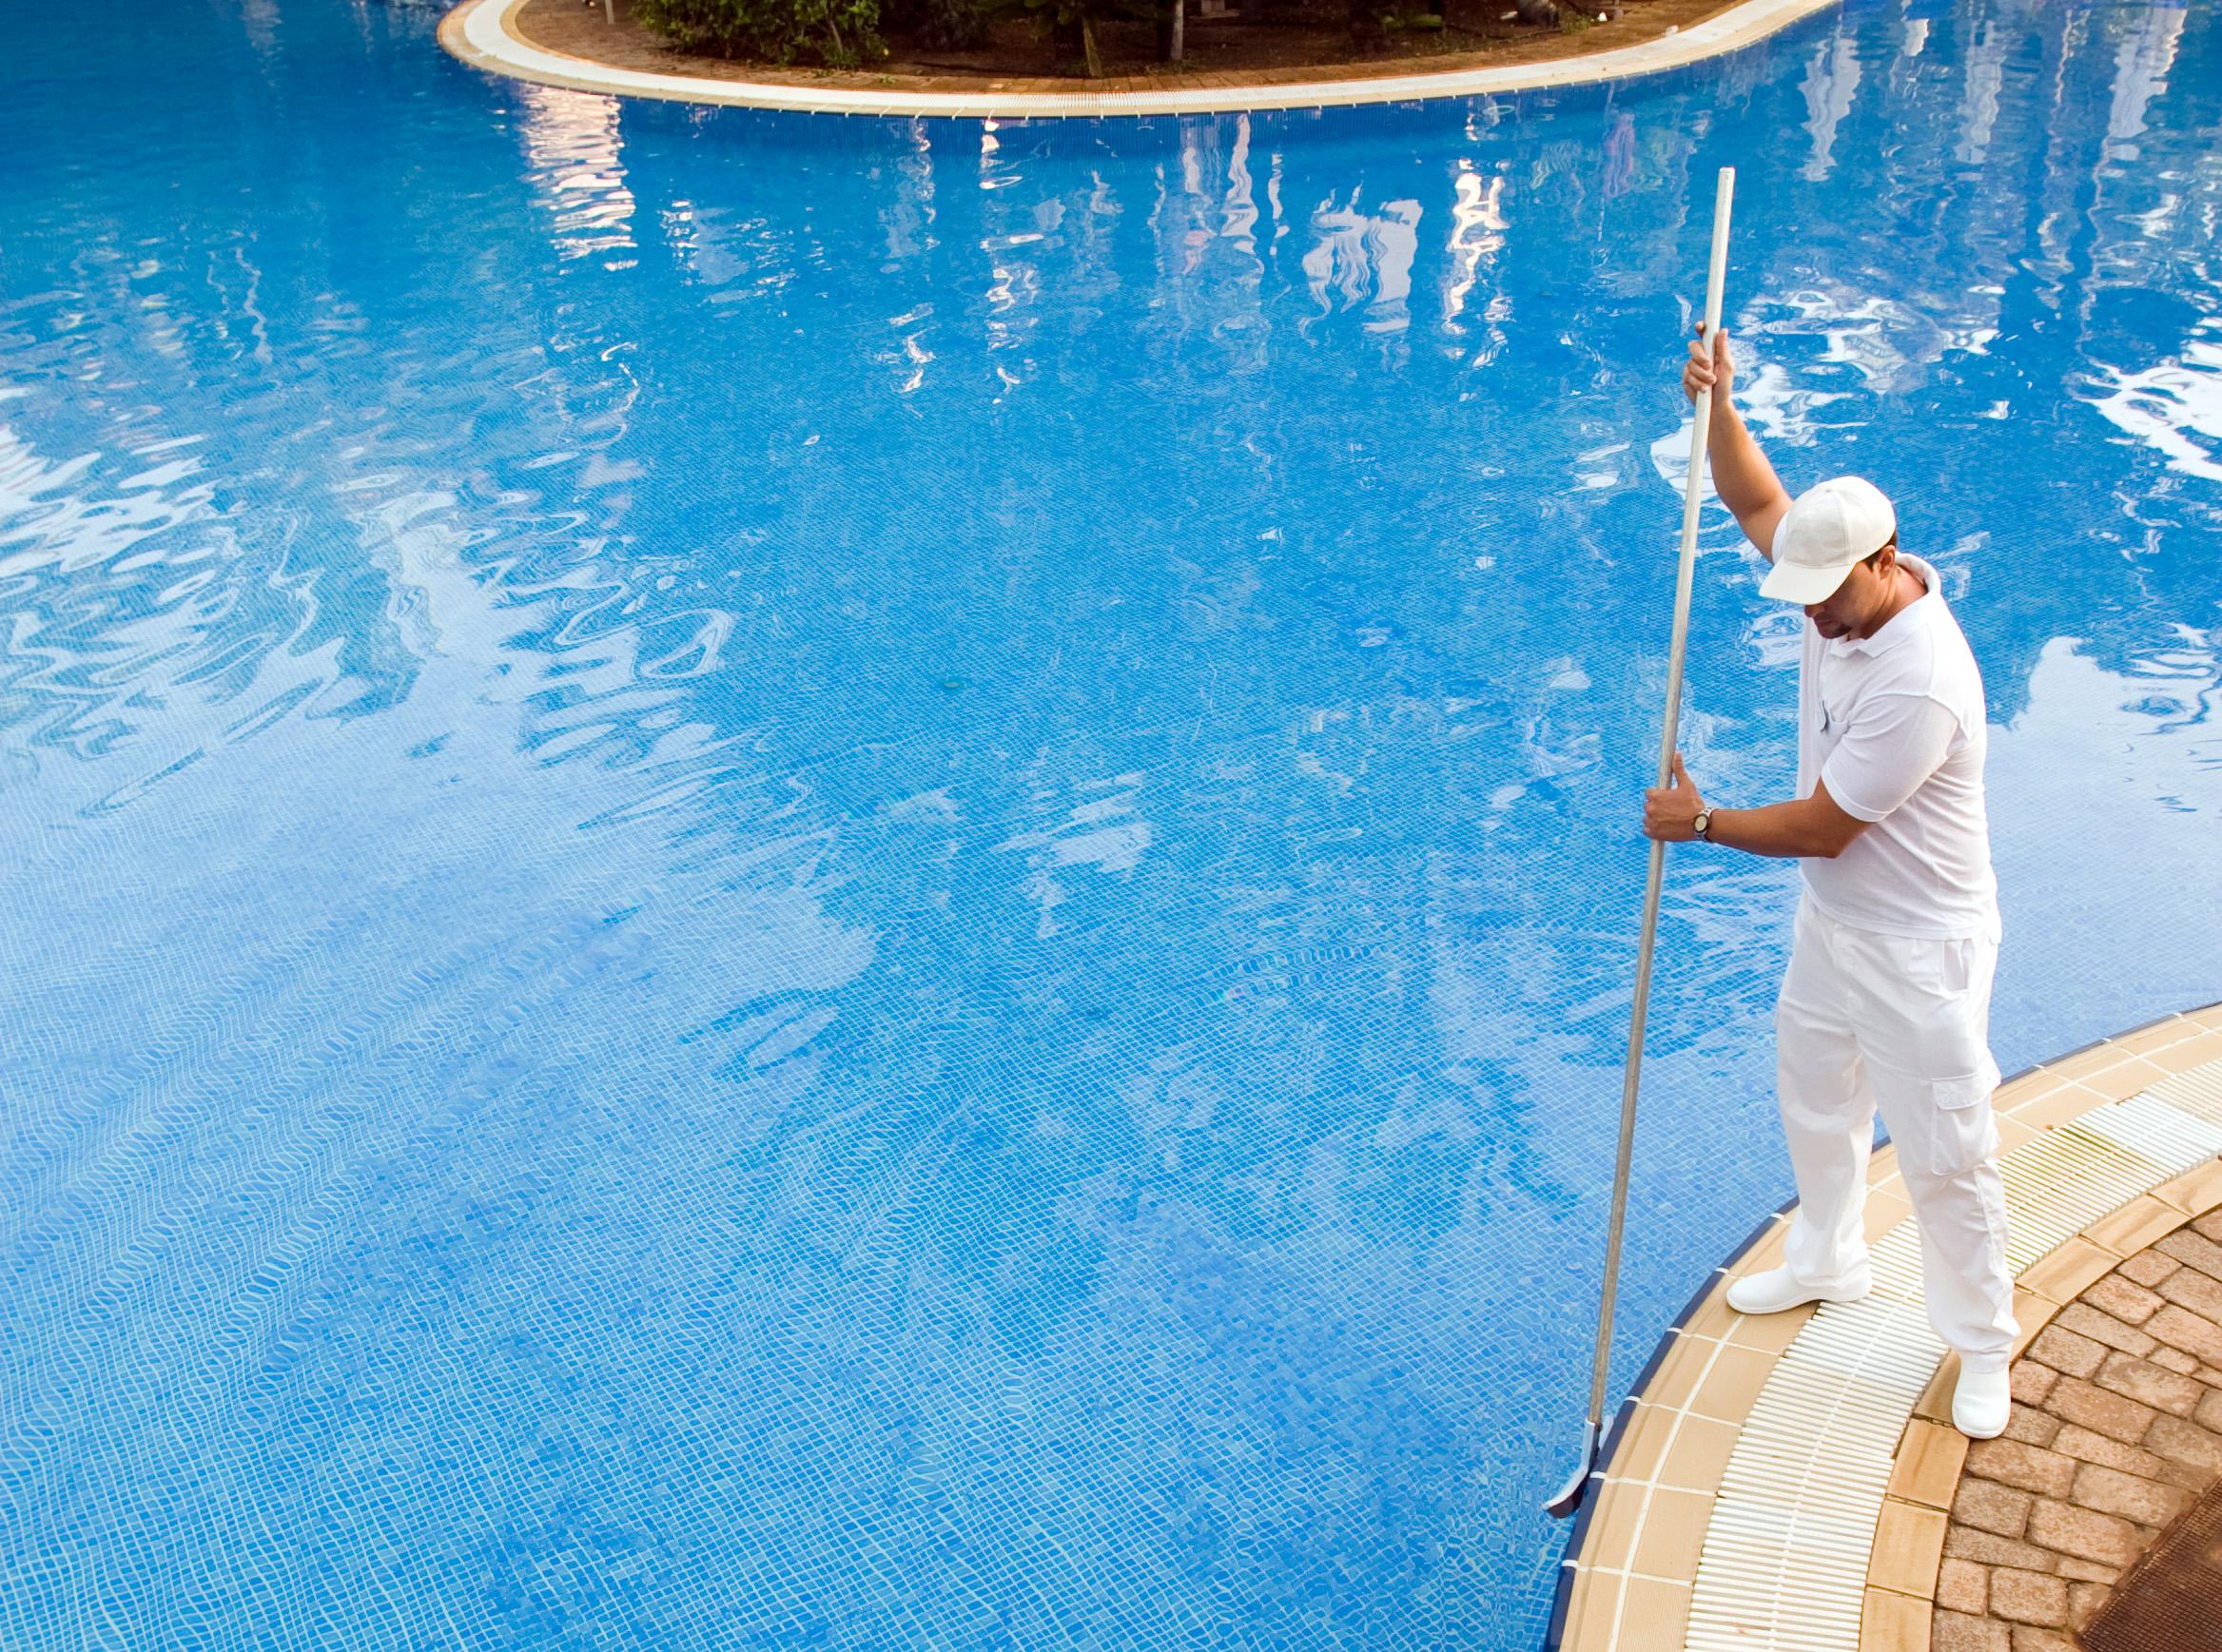 swimming pool guy sweeping the pool's walls